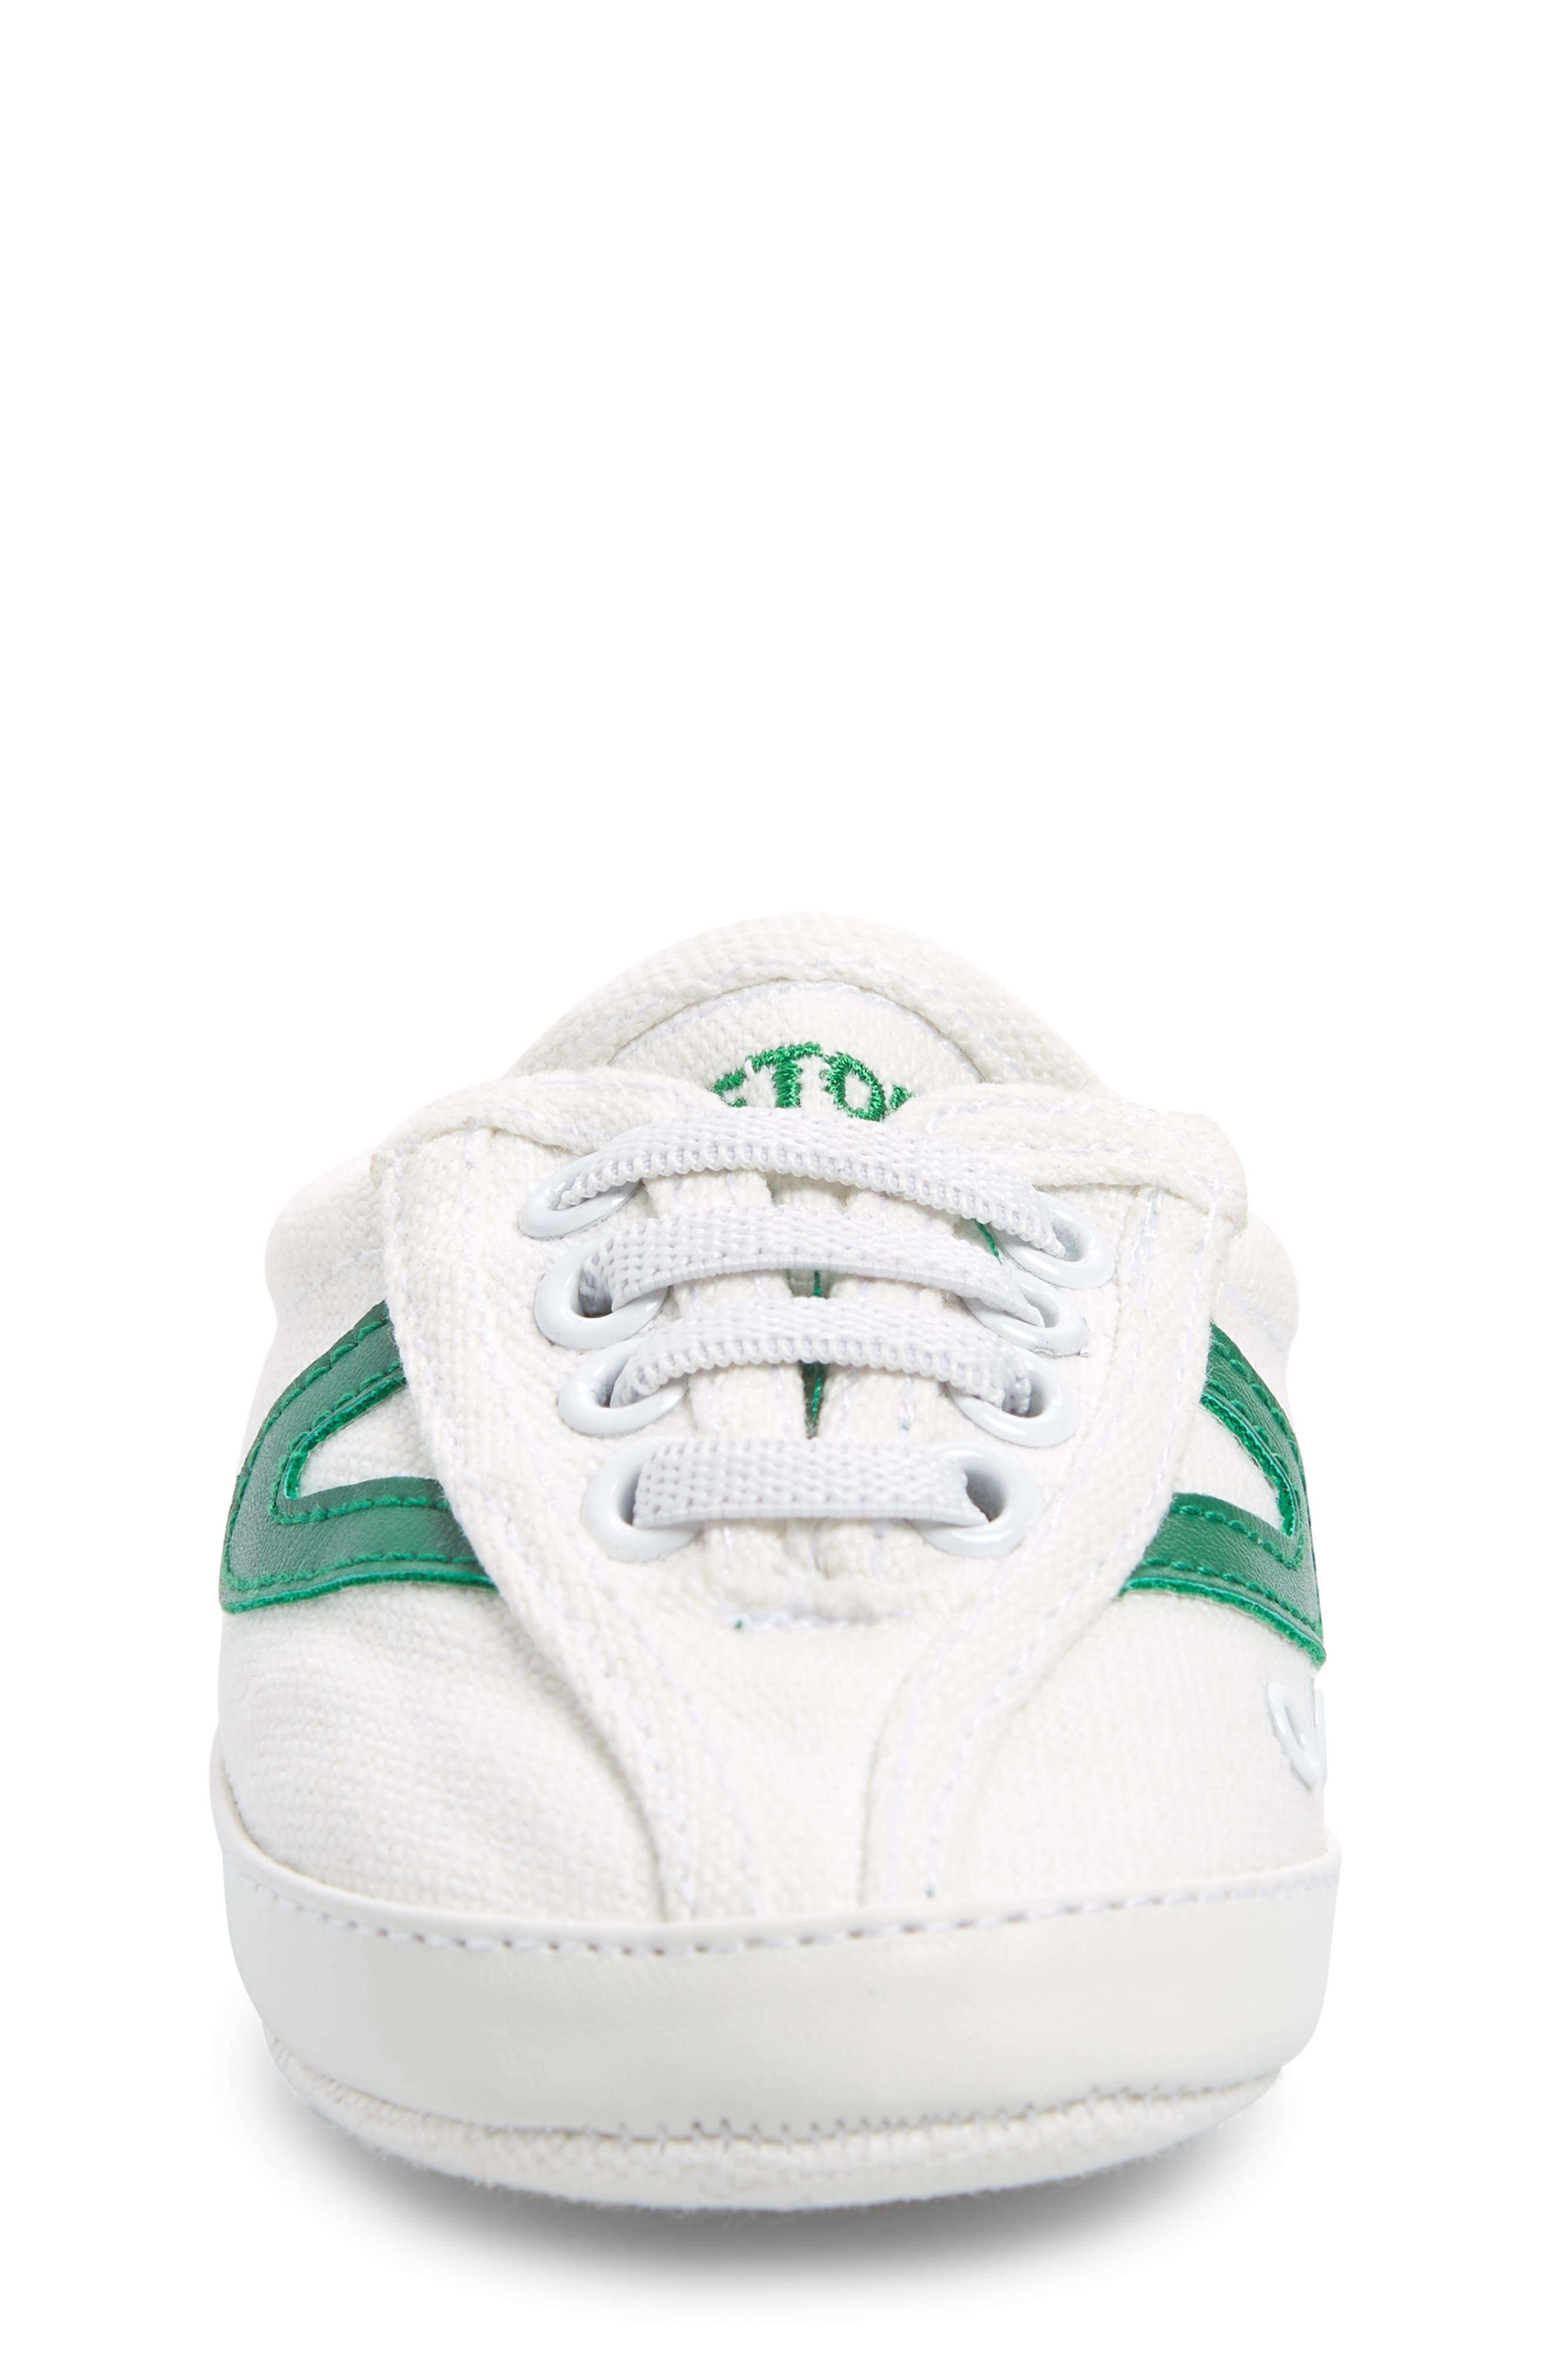 Nylite Plus Sneaker,                             Alternate thumbnail 4, color,                             WHITE/ GREEN